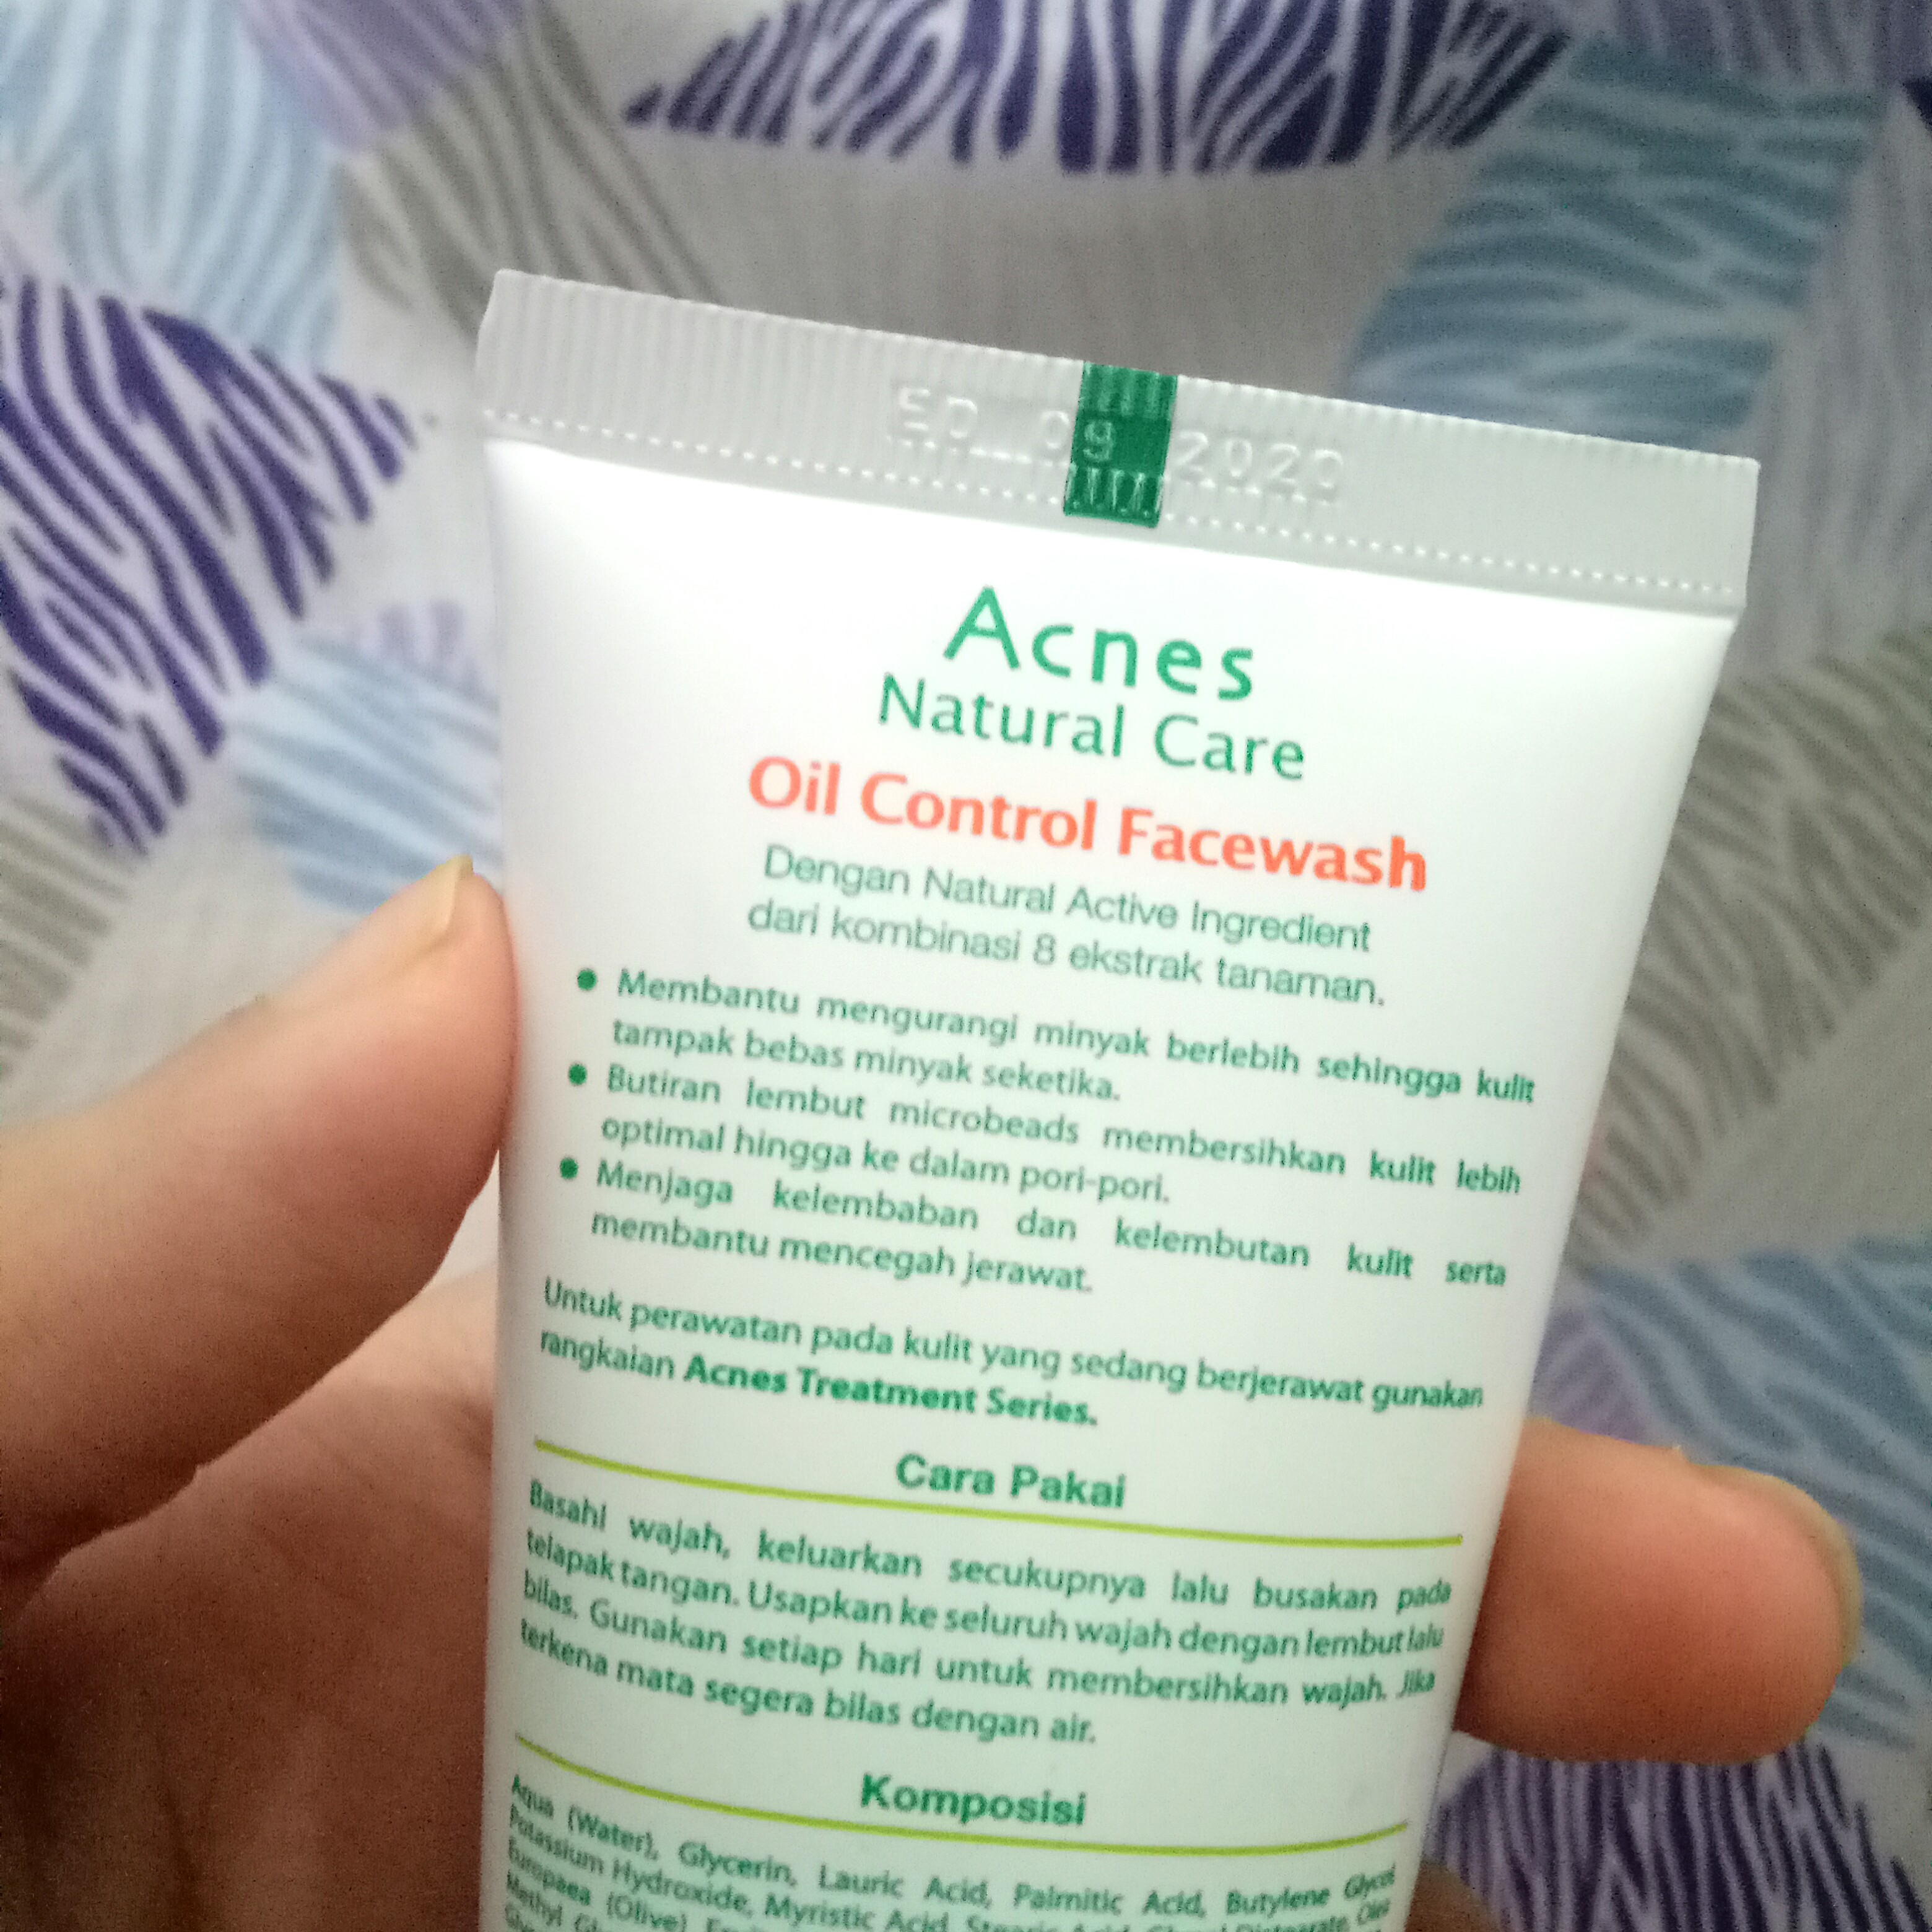 Acnes Facewash Oil Control Spot Care Obat Jerawat Treatment Series Kesehatan Kecantikan Kulit Sabun Tubuh Di Carousell